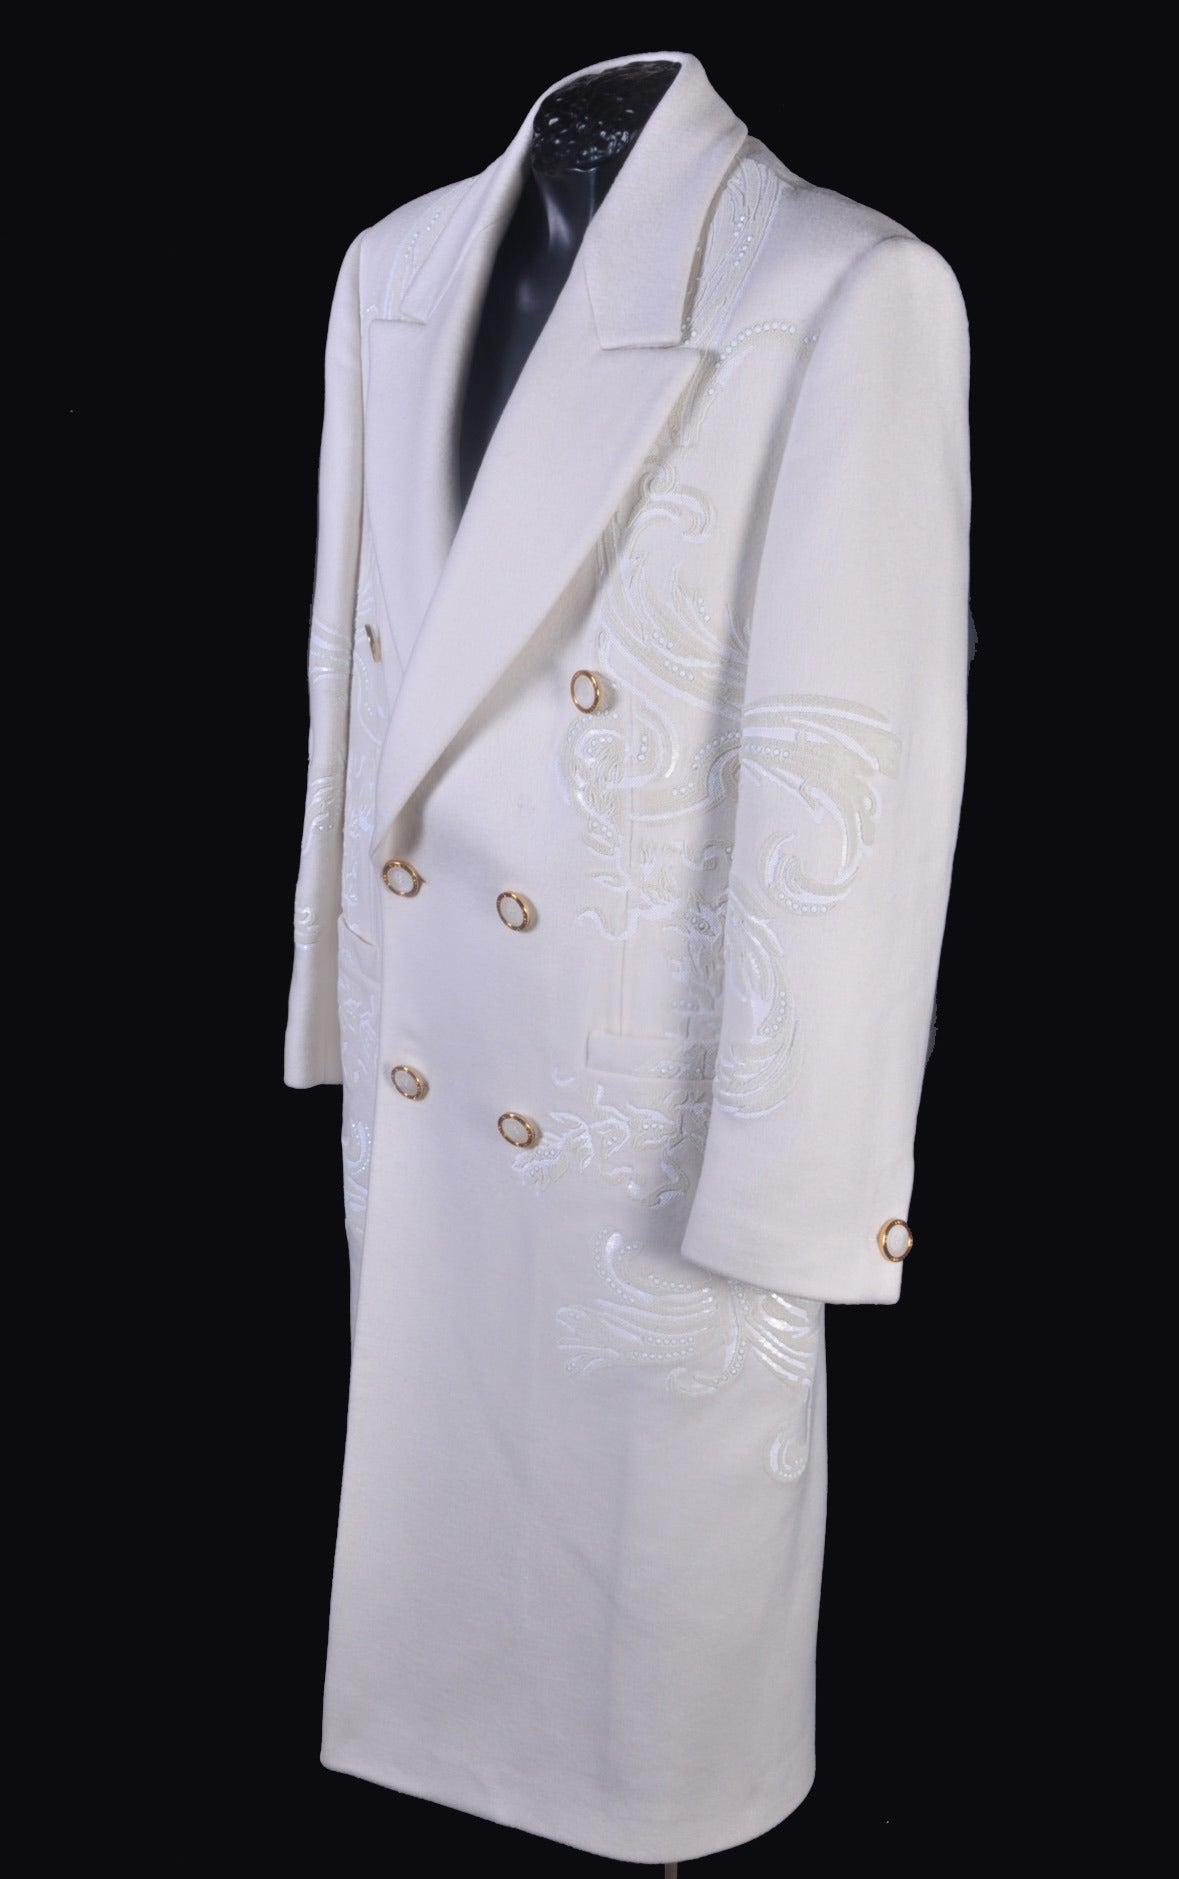 Men's New VERSACE WHITE 100% CASHMERE EMBELLISHED MEN's COAT For Sale